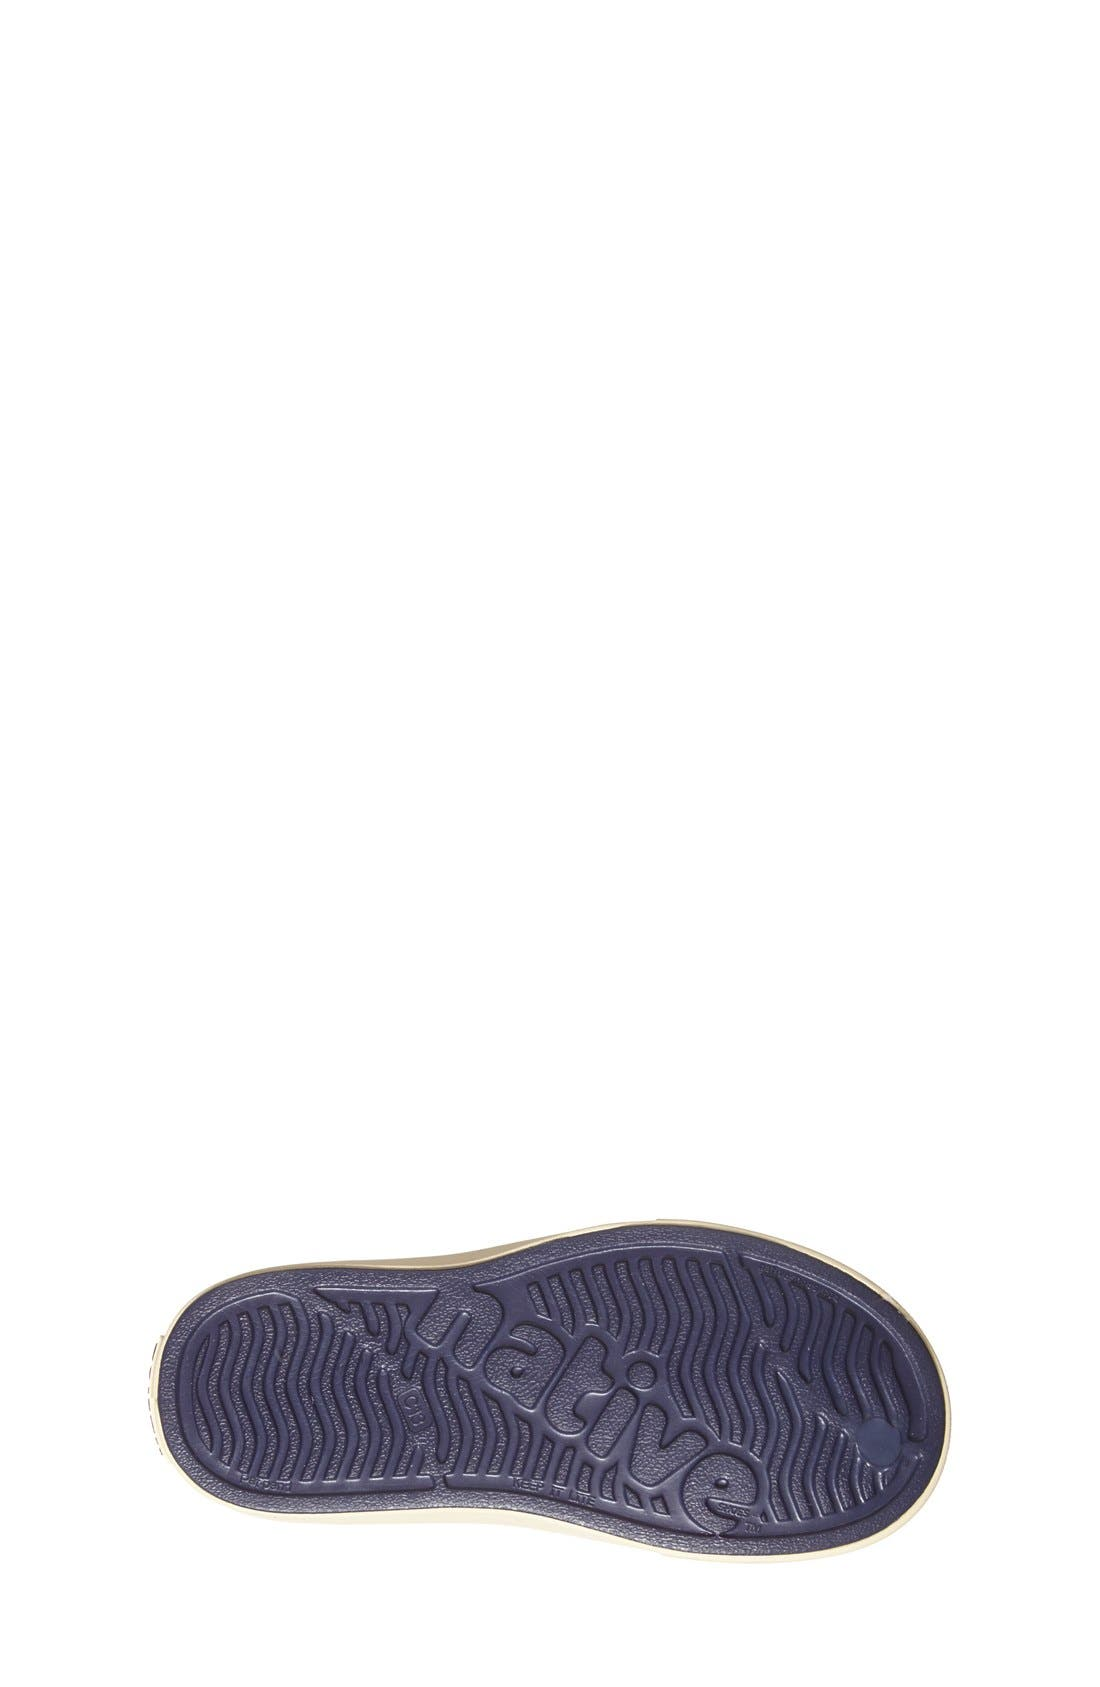 Alternate Image 4  - Native Shoes 'Miller' Slip-On (Baby, Walker, Toddler & Little Kid)